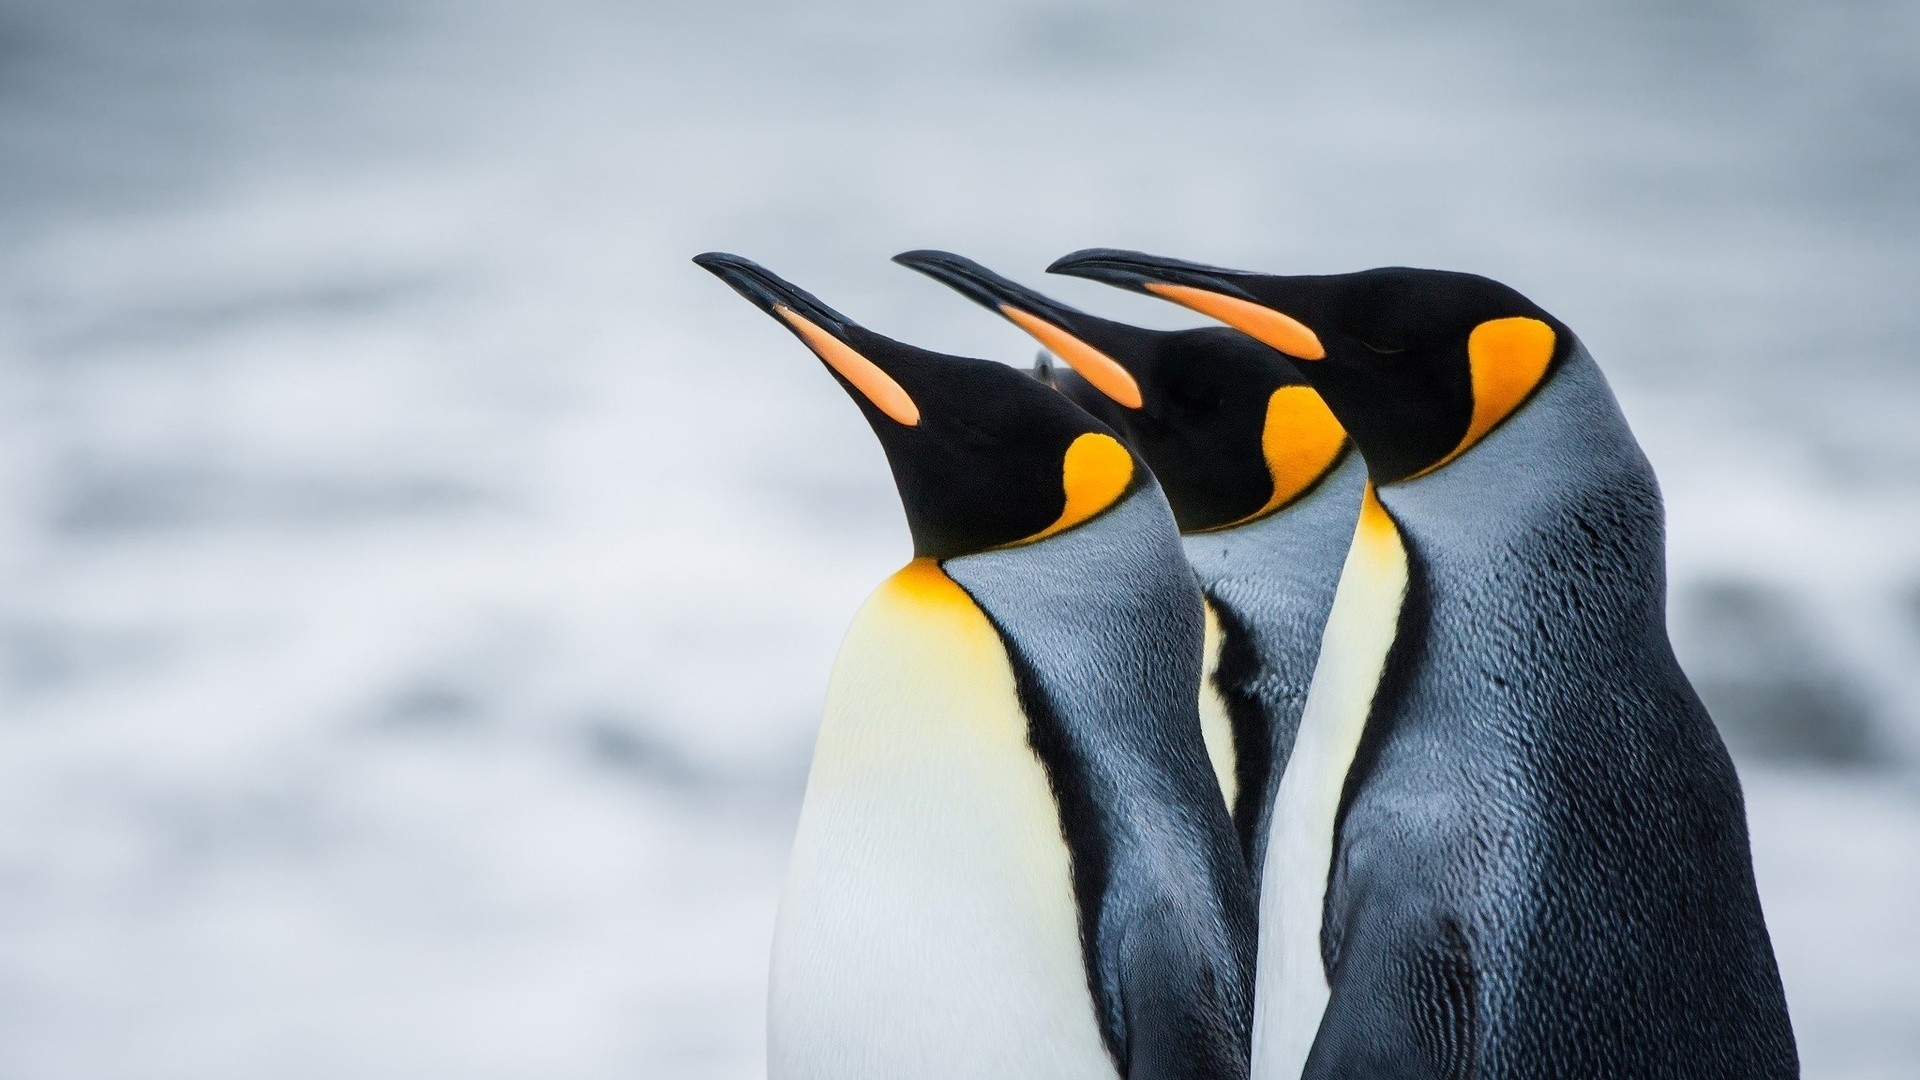 Penguin High Quality